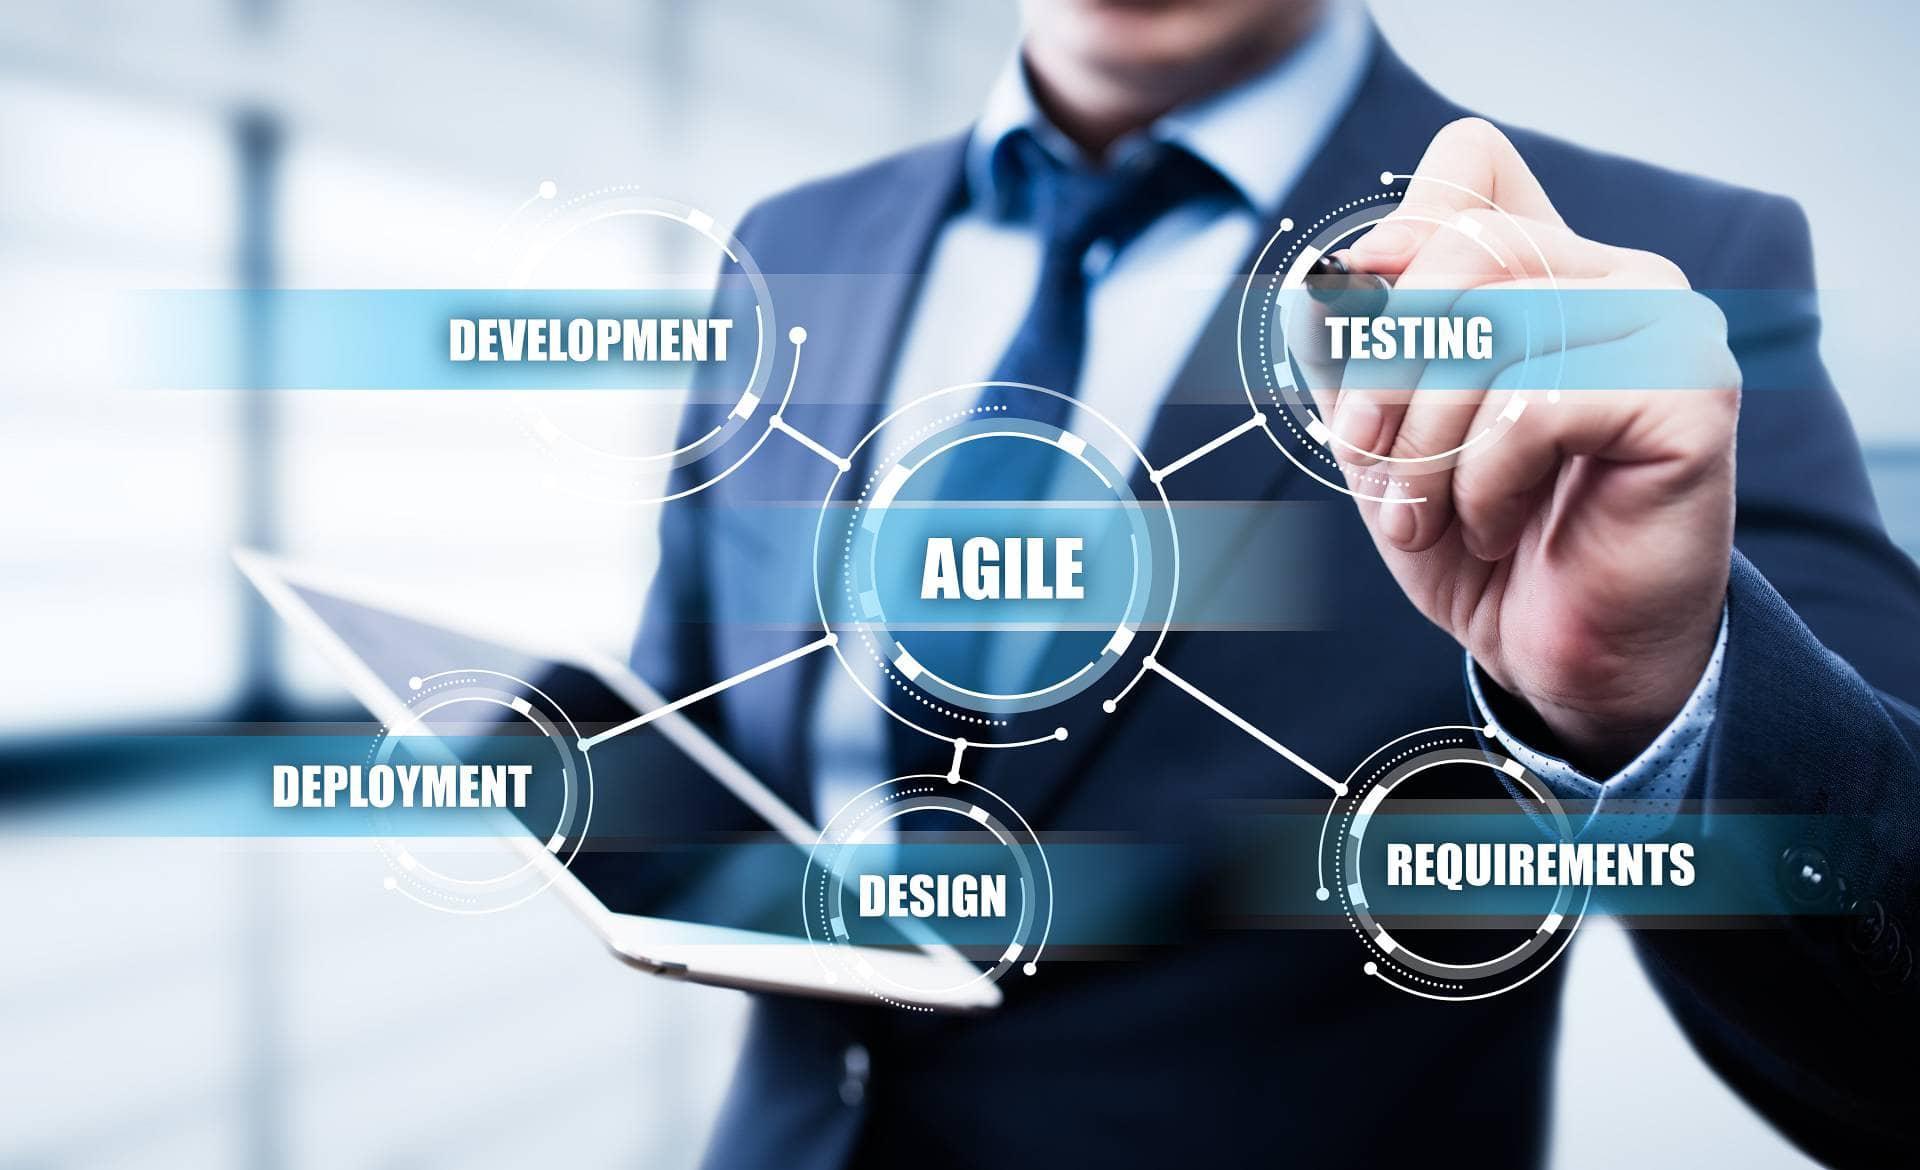 Top 7 Benefits of Agile Development in 2021